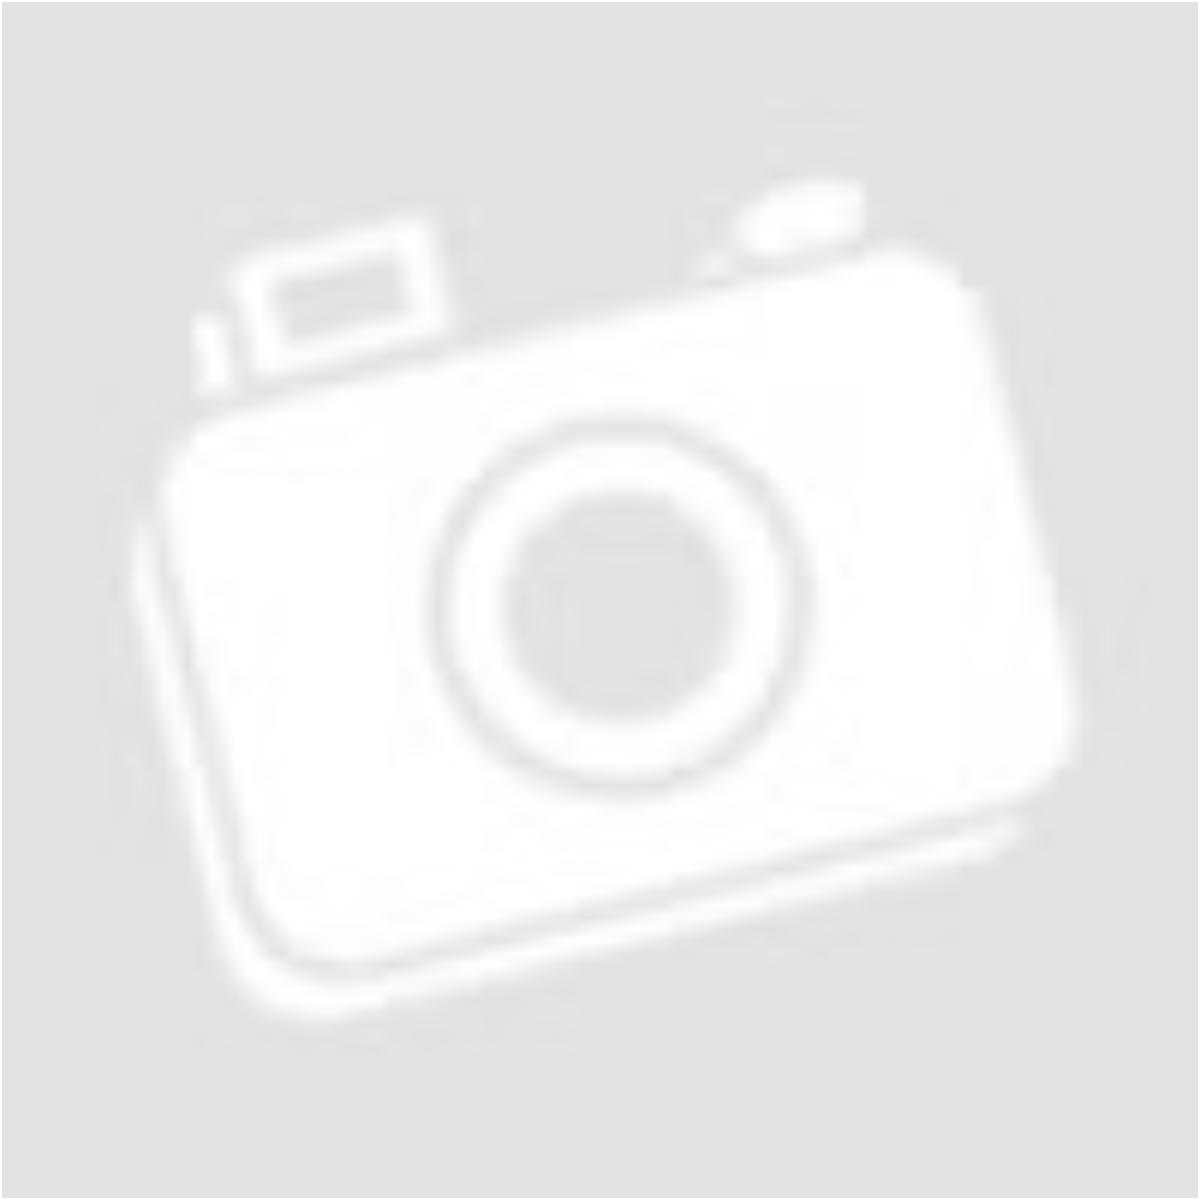 BIANCHI METHANOL CV S 9.1 - X0/GX EAGLE 1X12SP kerékpár